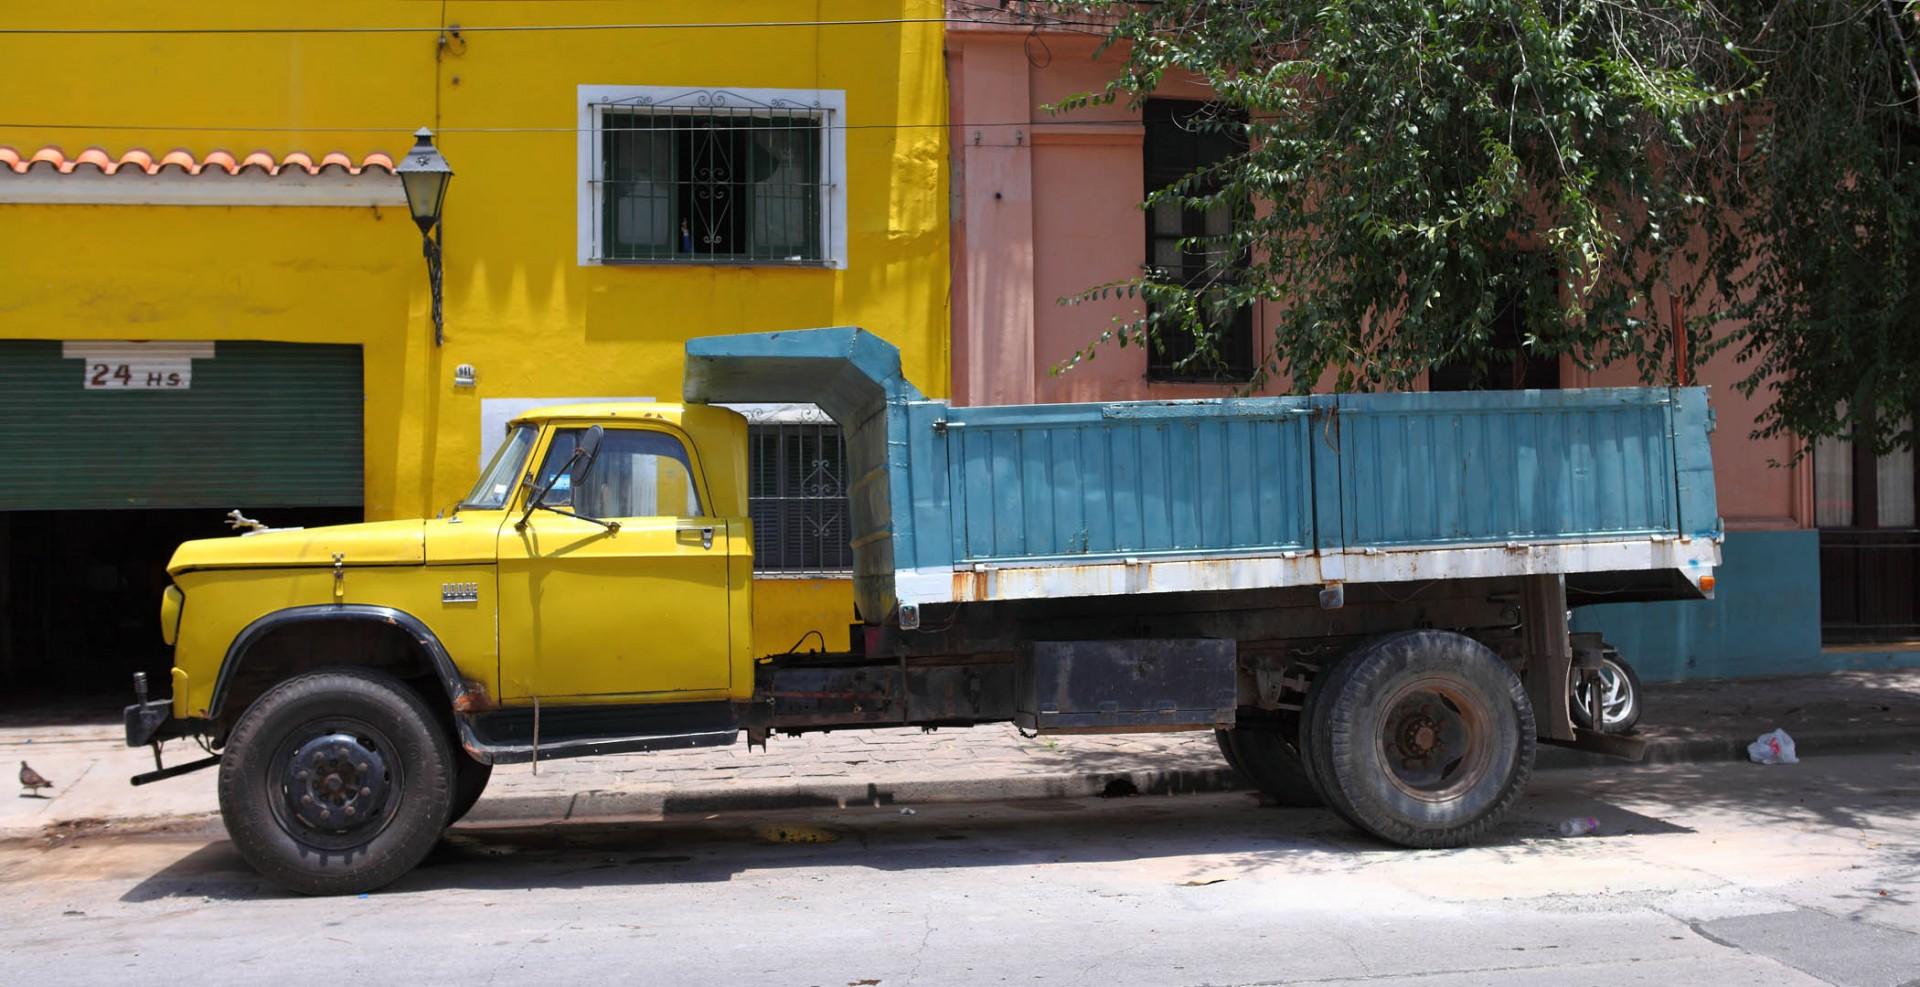 Reportage-Fotograf-in-Paris-Reportage-Fotografie-truck-in-argentinien